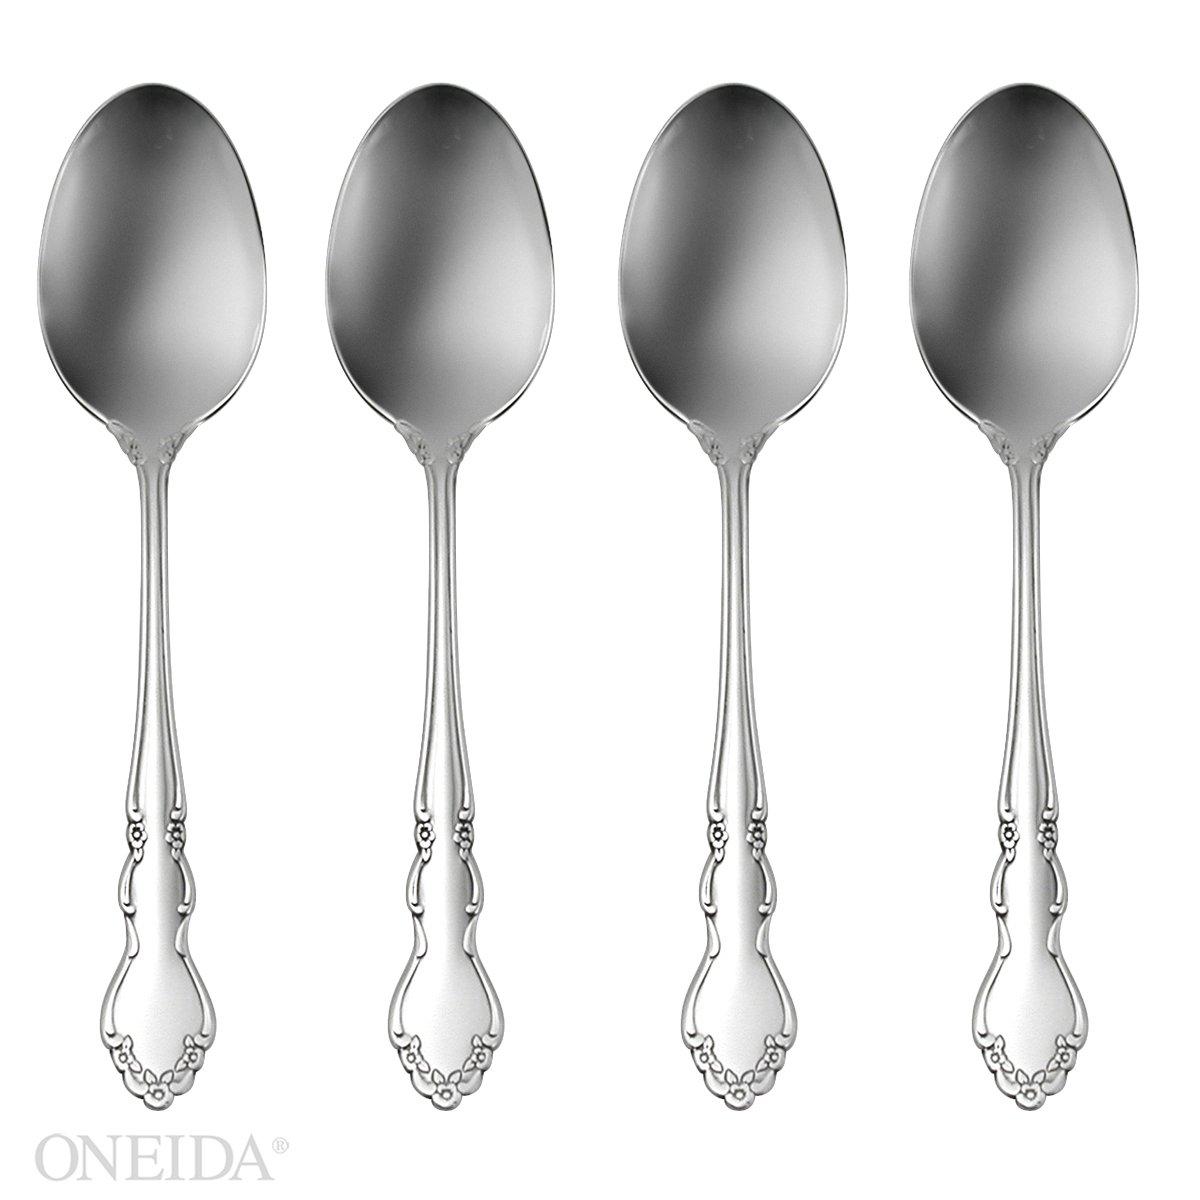 Oneida Dover Fine Flatware Set, 18/10 Stainless, Set of 4 Dinner Spoons by Oneida